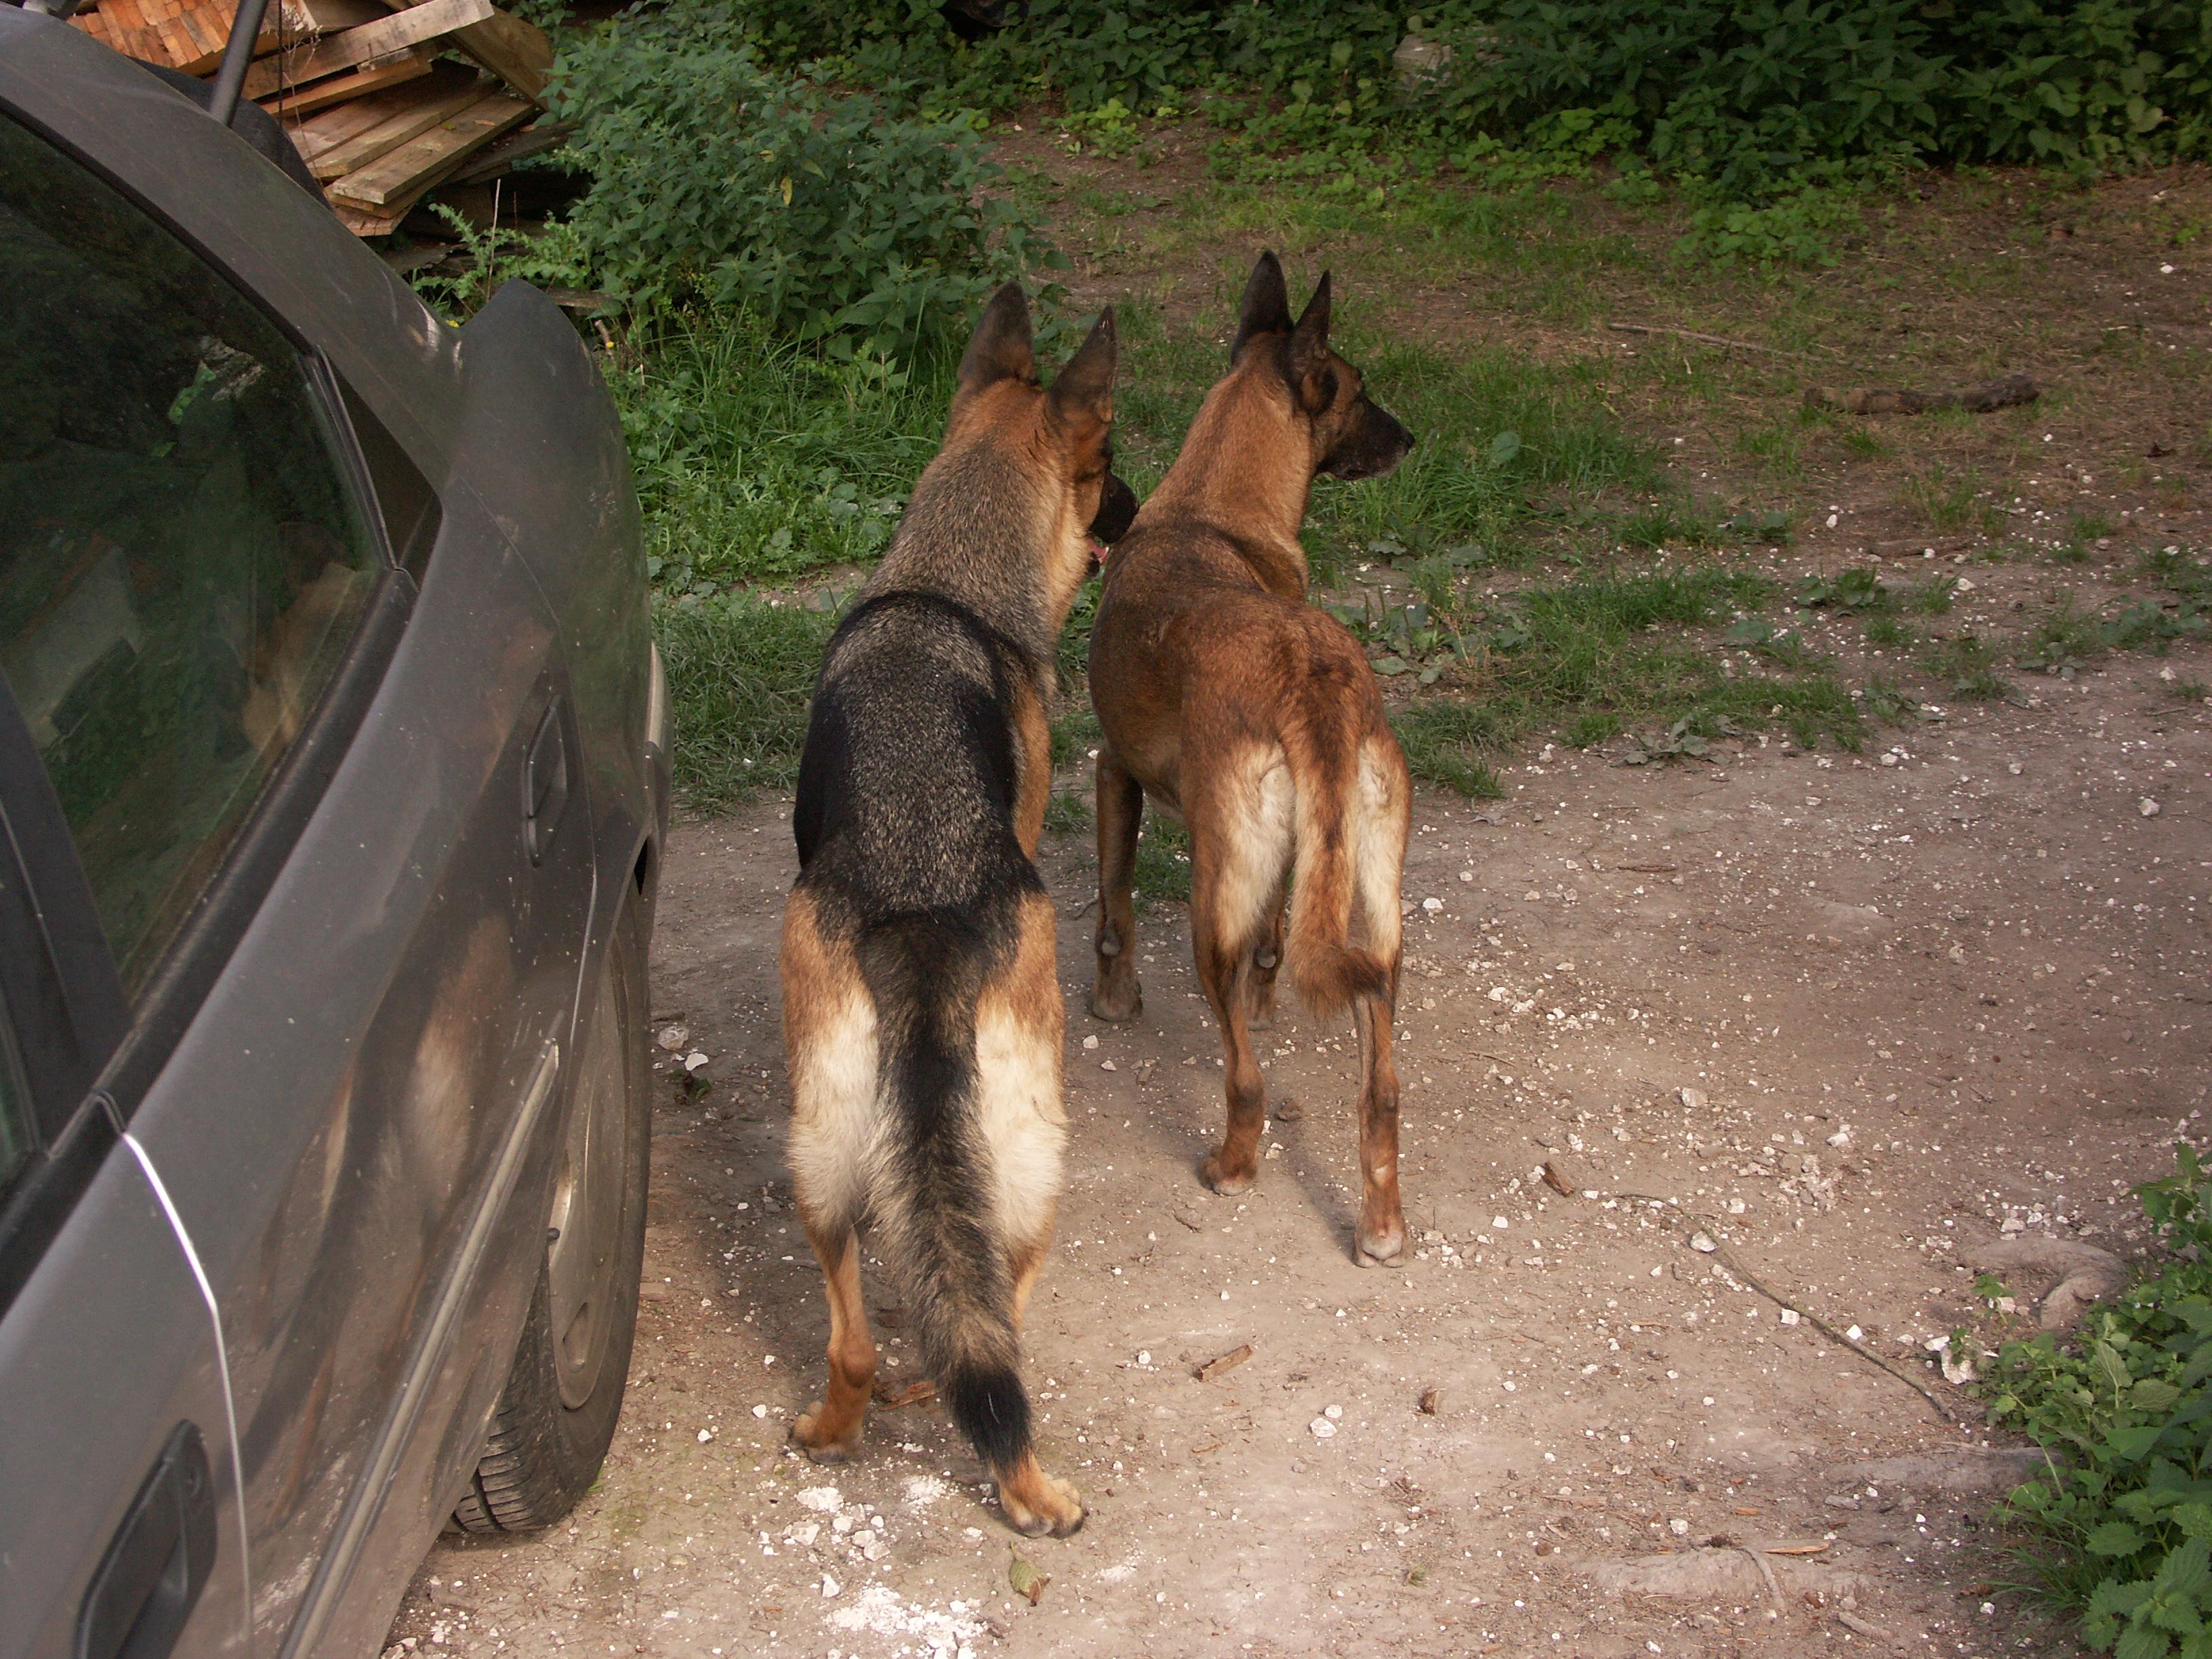 mes deux chiennes vont mourir... - Page 4 16910020060907003VelennesScaryUlna